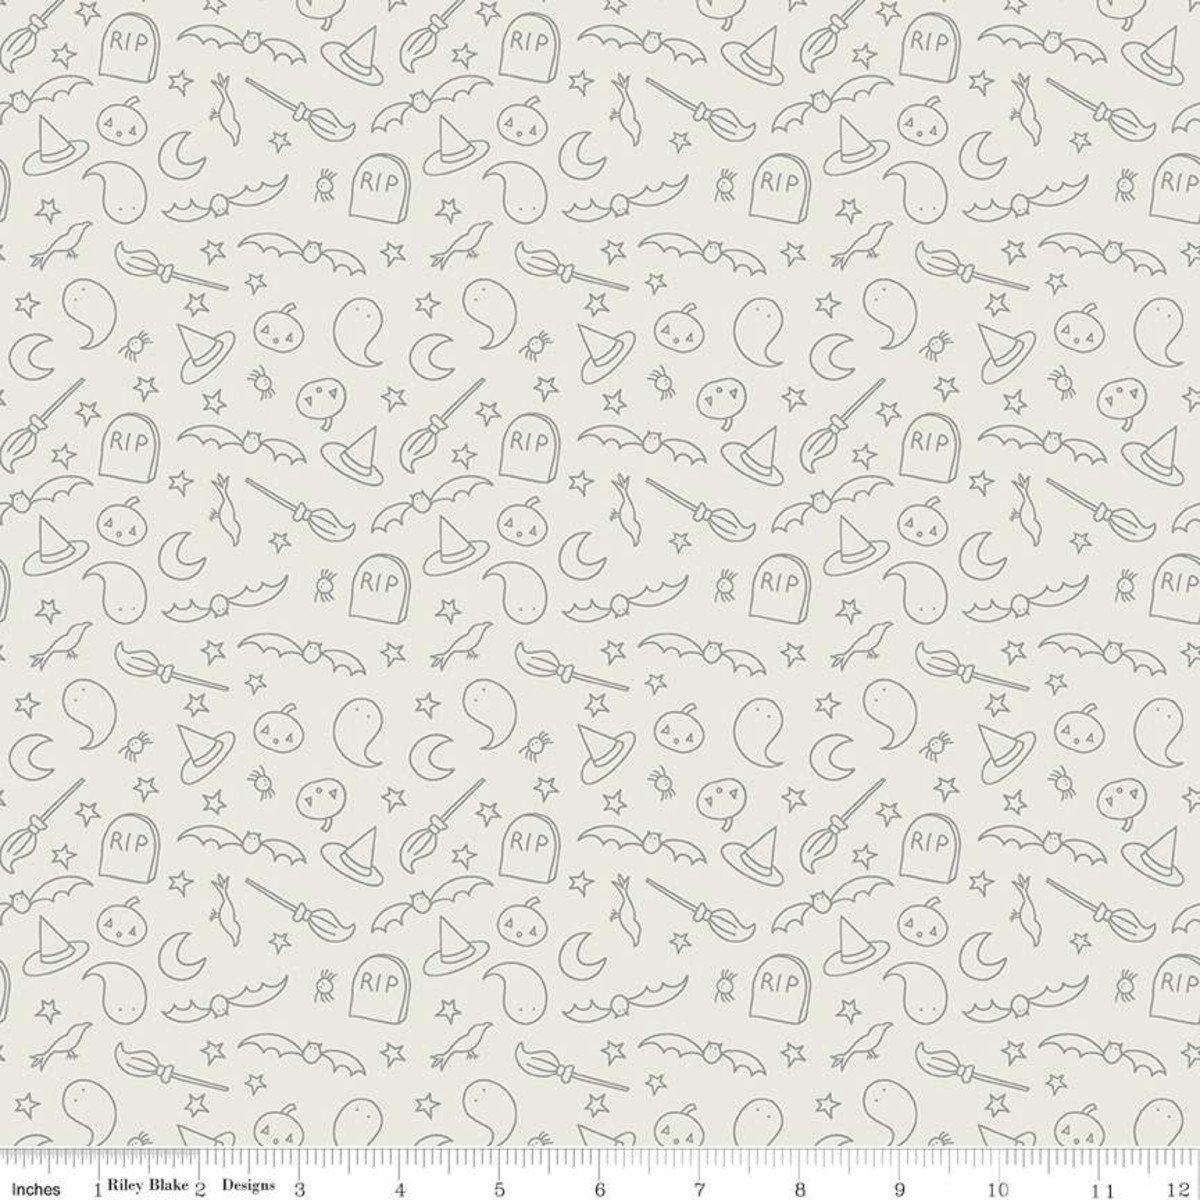 Riley Blake Designs, Spooky Hollow - Icons Eggshell